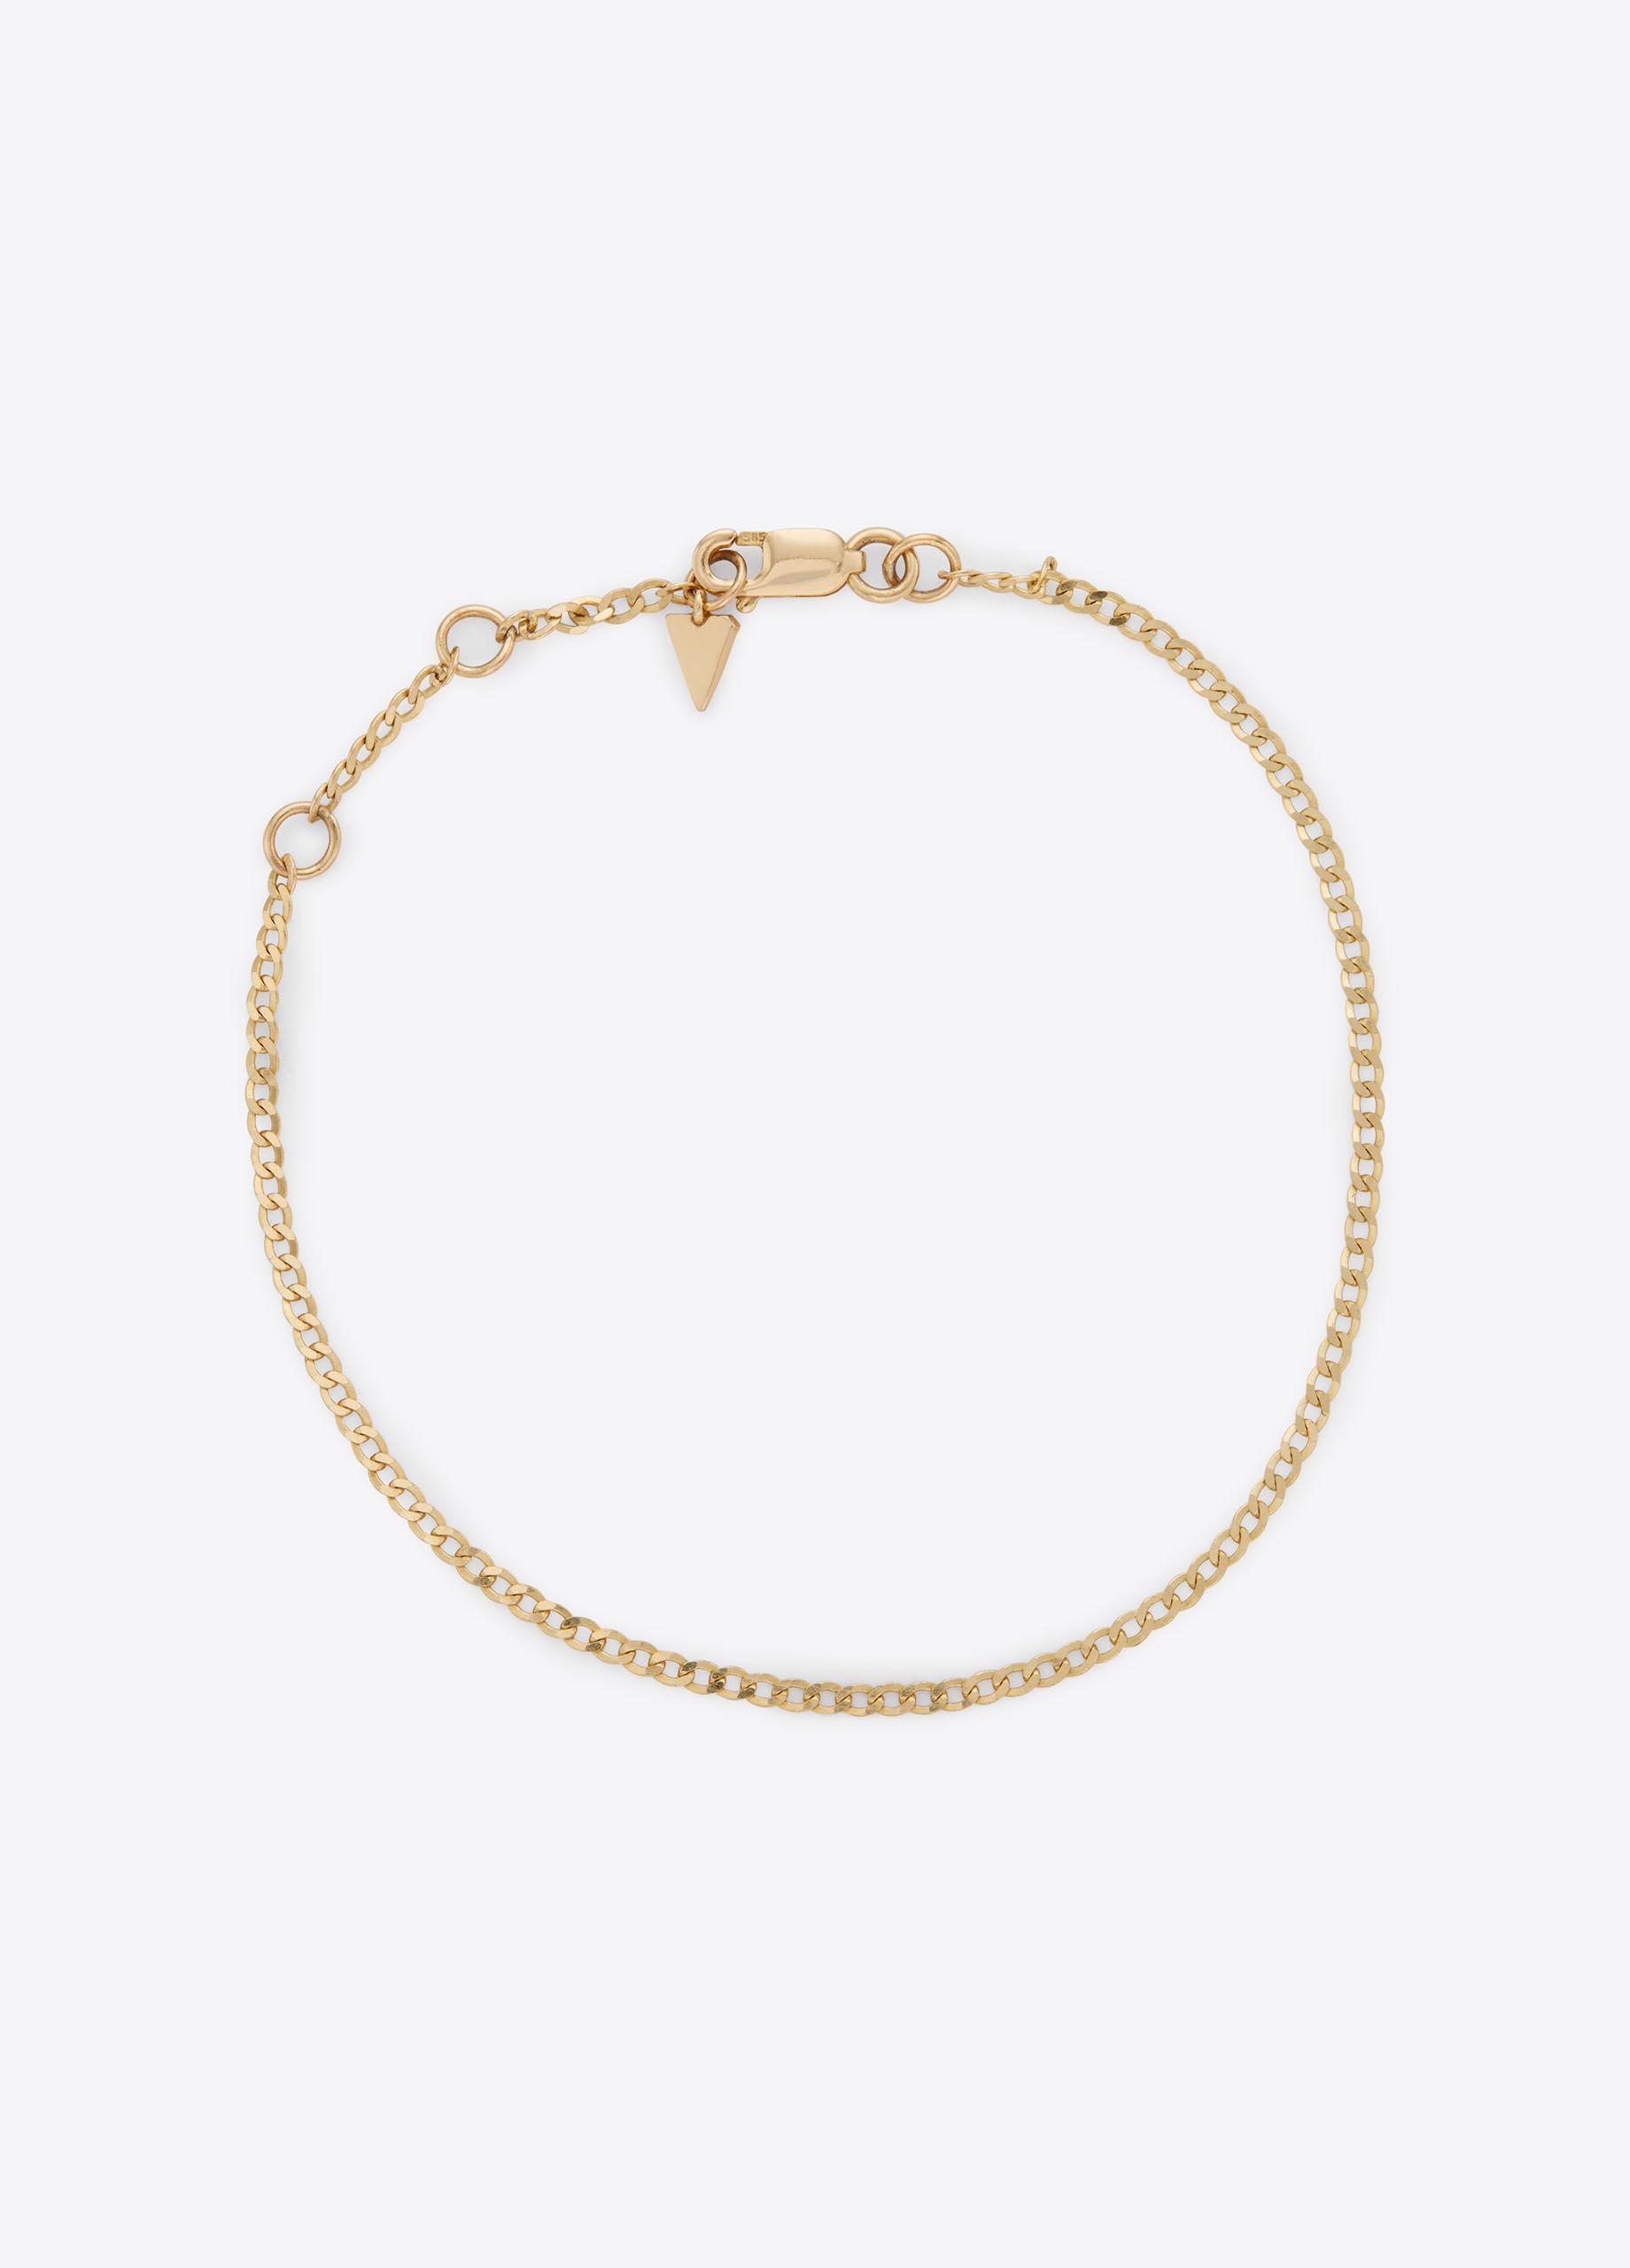 Vince Loren Stewart / Classic Curb 14-Karat Gold Chain Bracelet Gold rH3whv1zcf